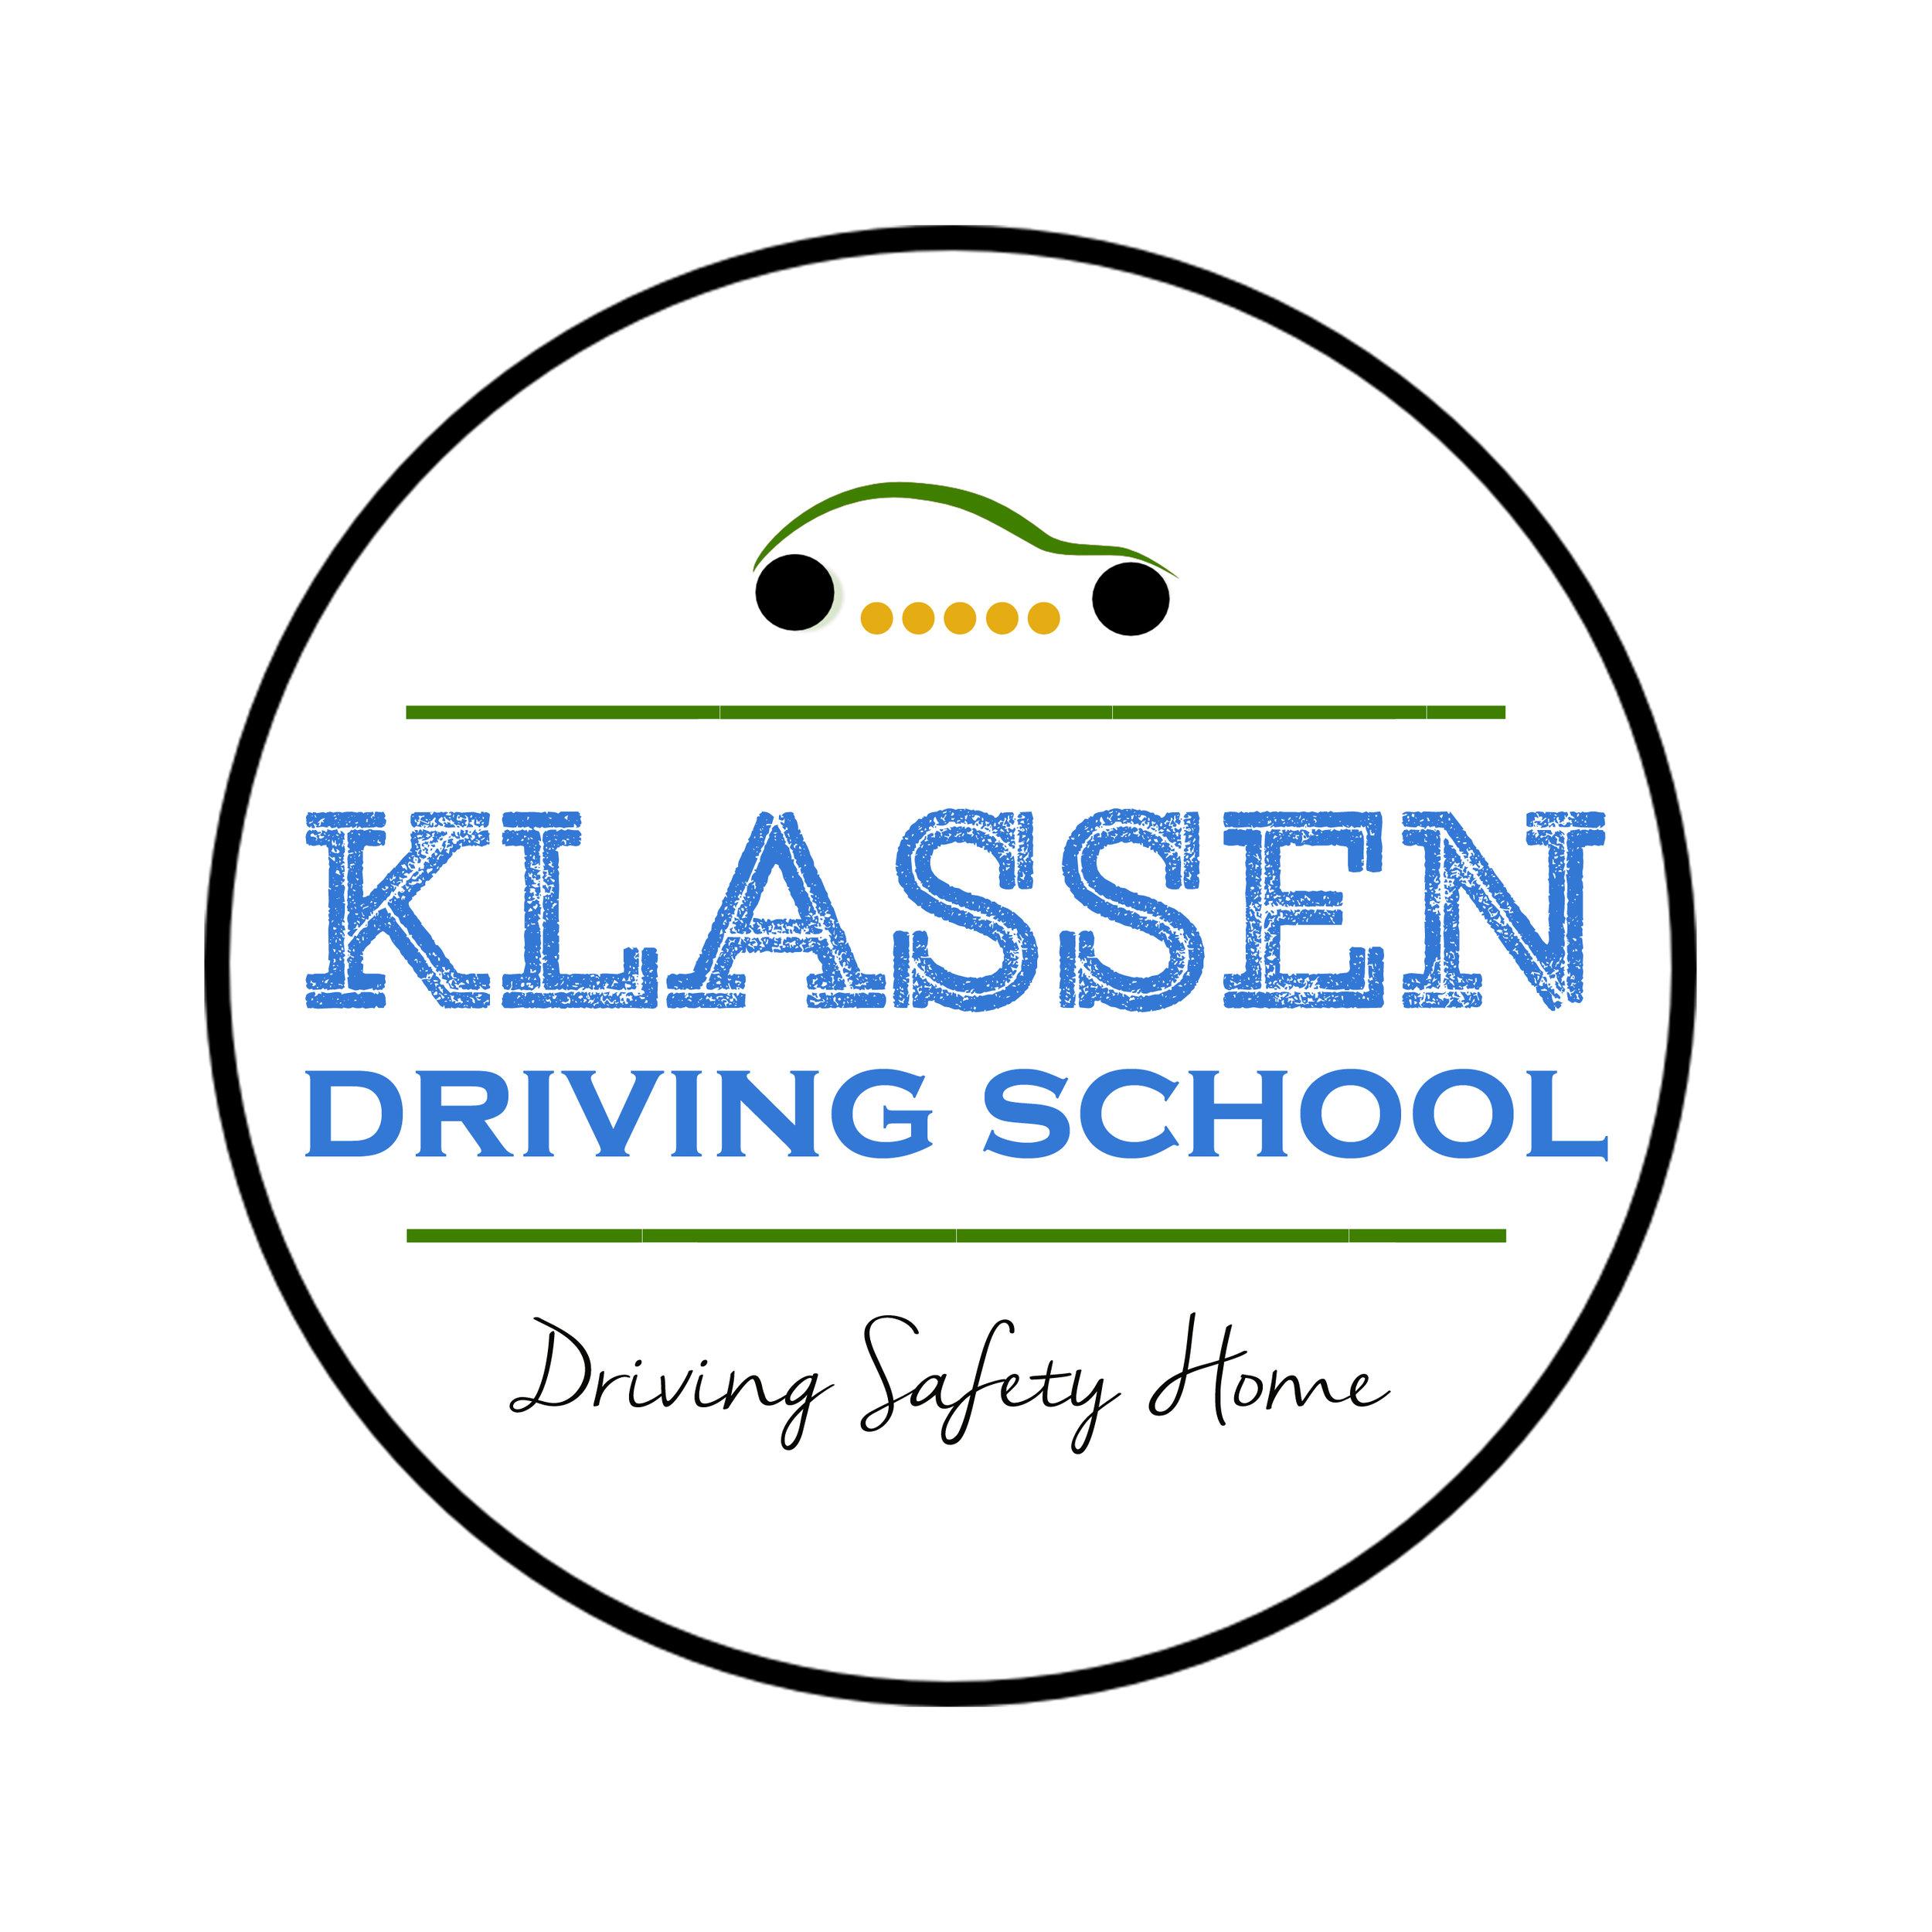 saskatoon logo design, lisa landrie, klassen driving school